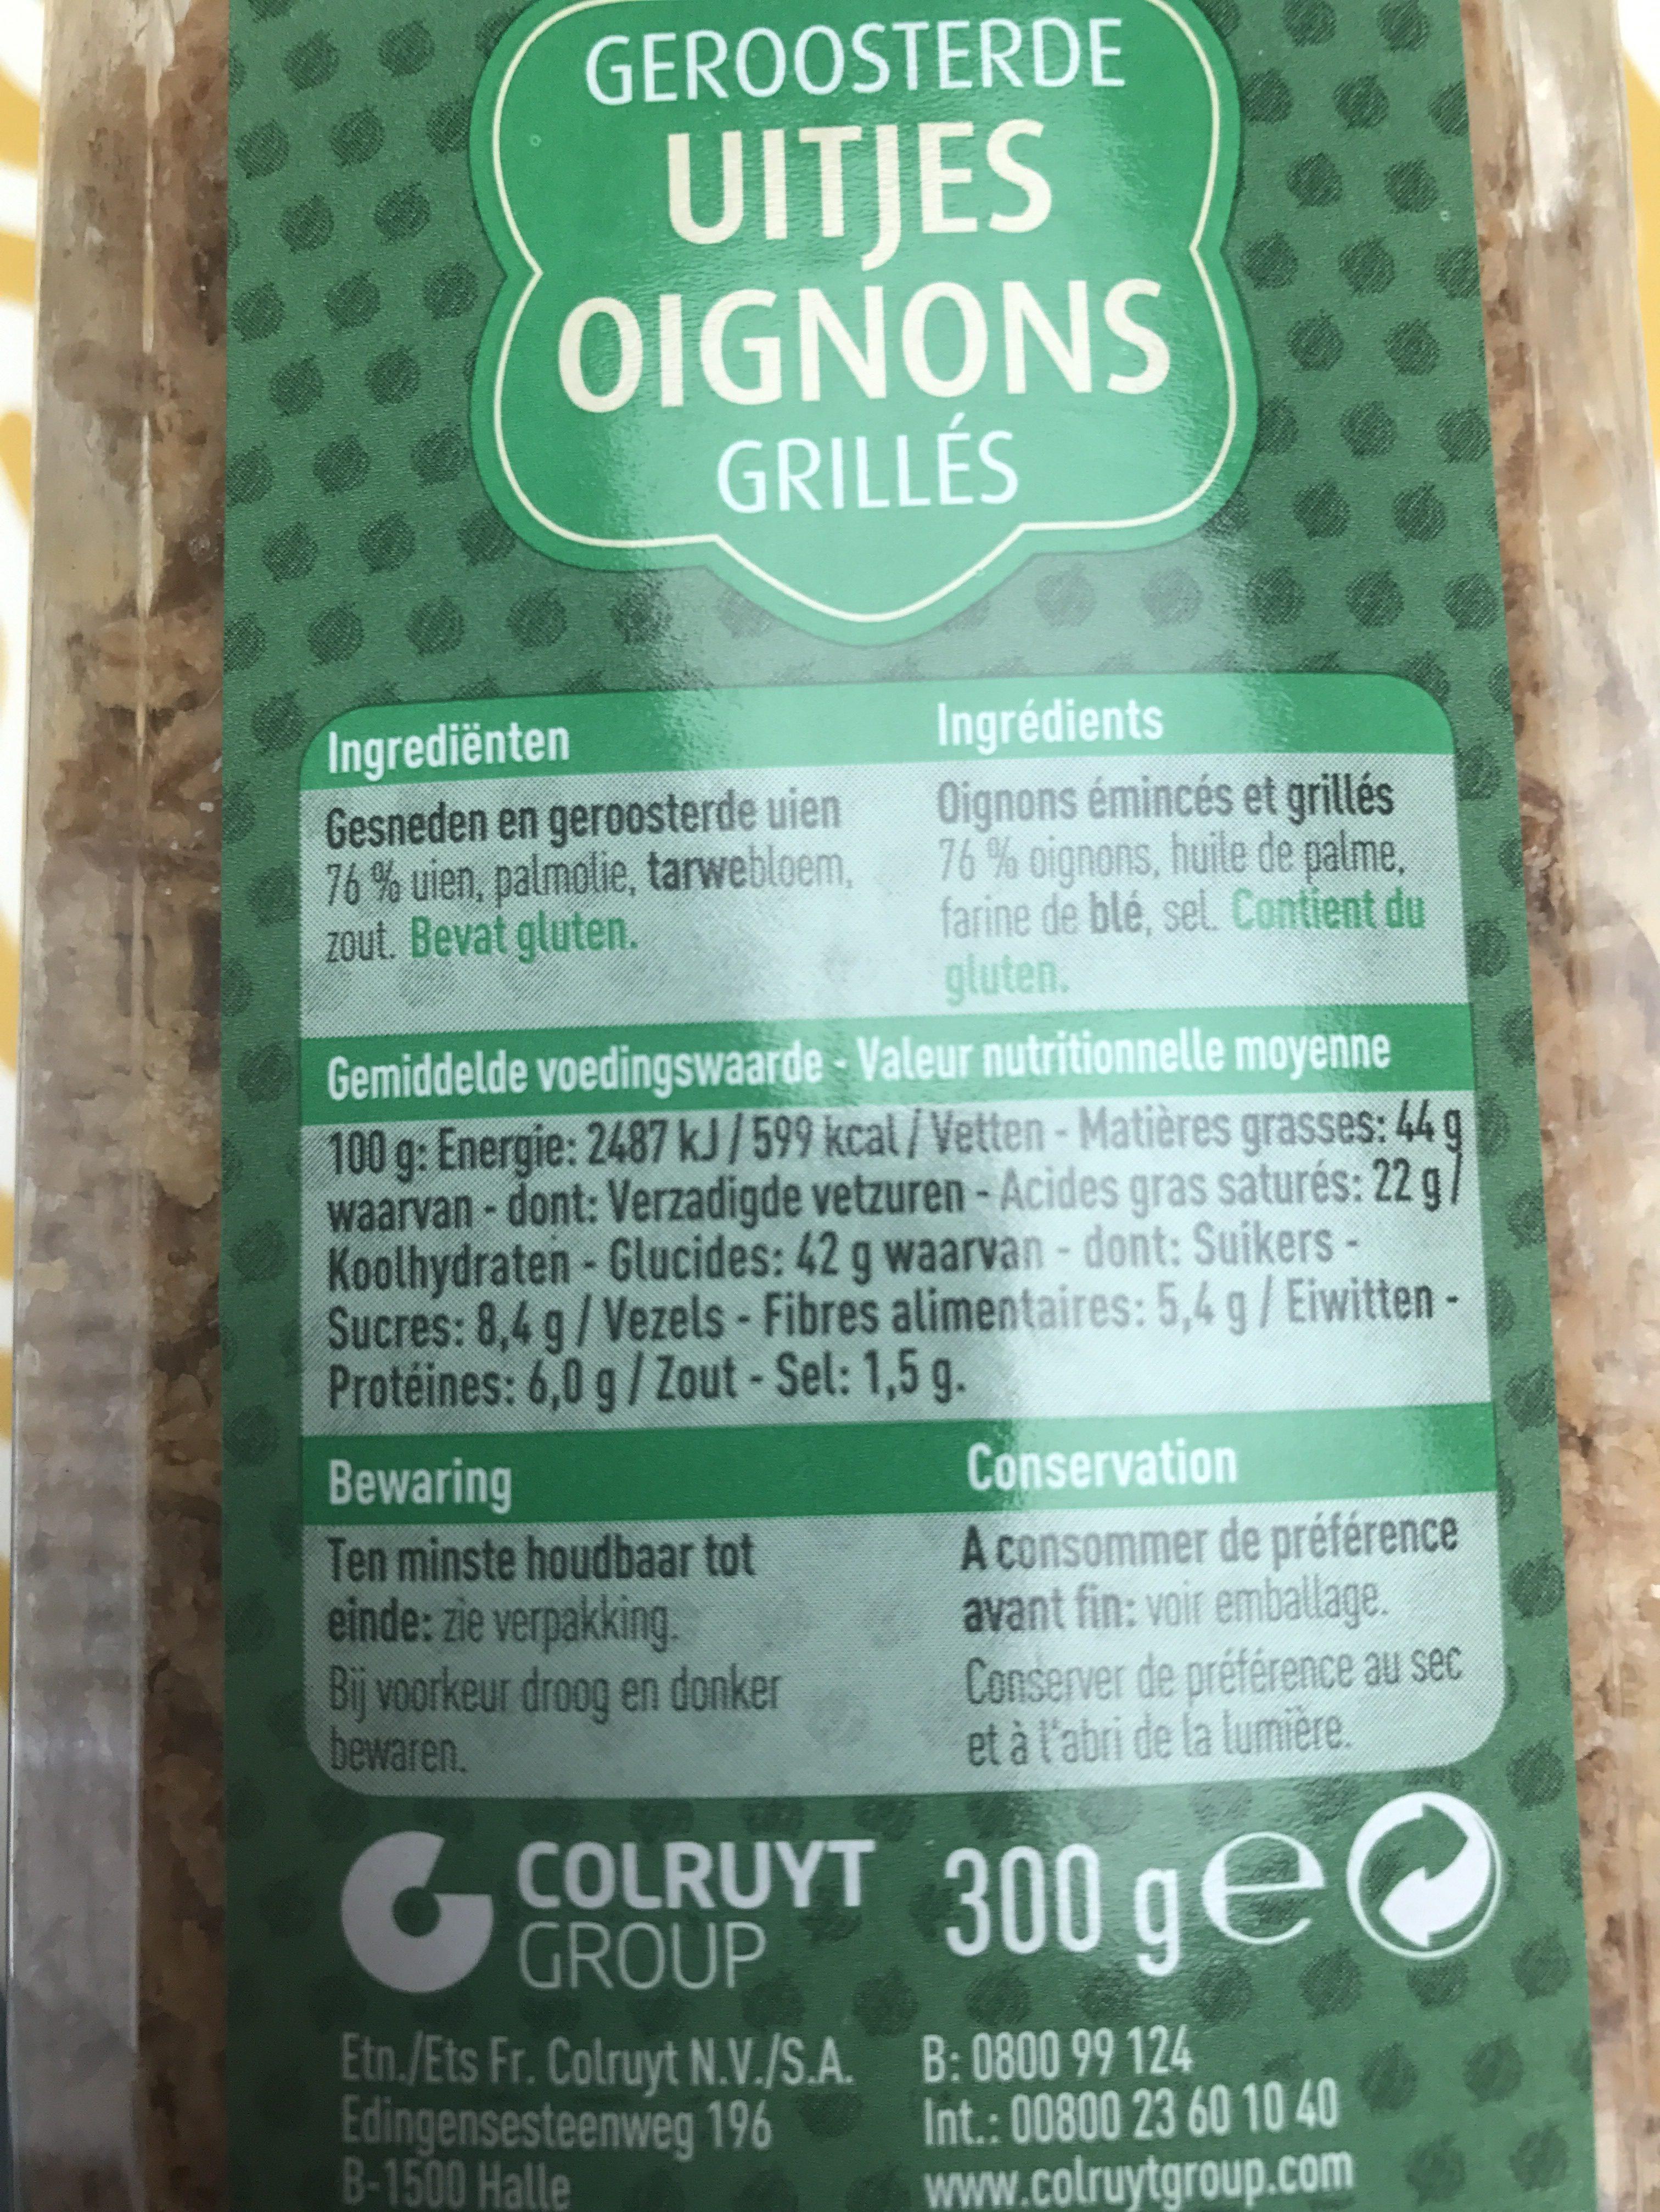 Oignons grillés - Ingrediënten - fr